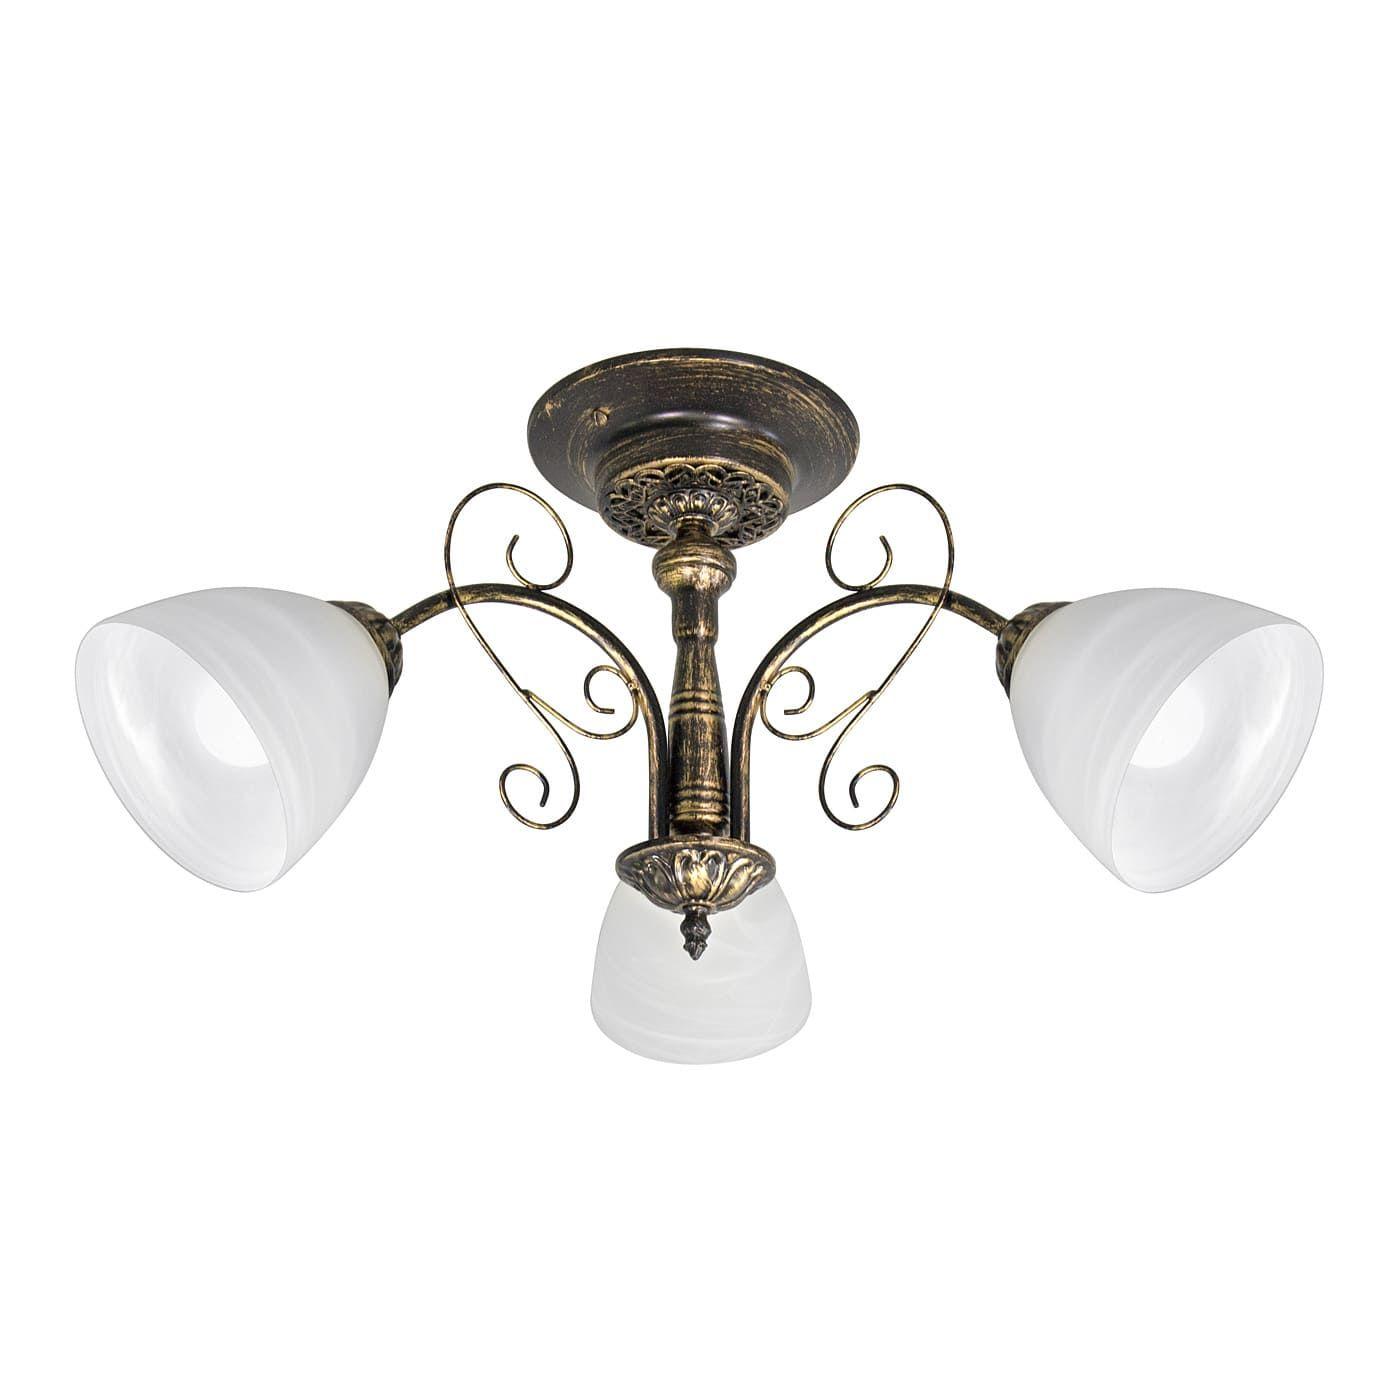 PETRASVET / Ceiling chandelier S2203-3, 3xE27 max. 60W